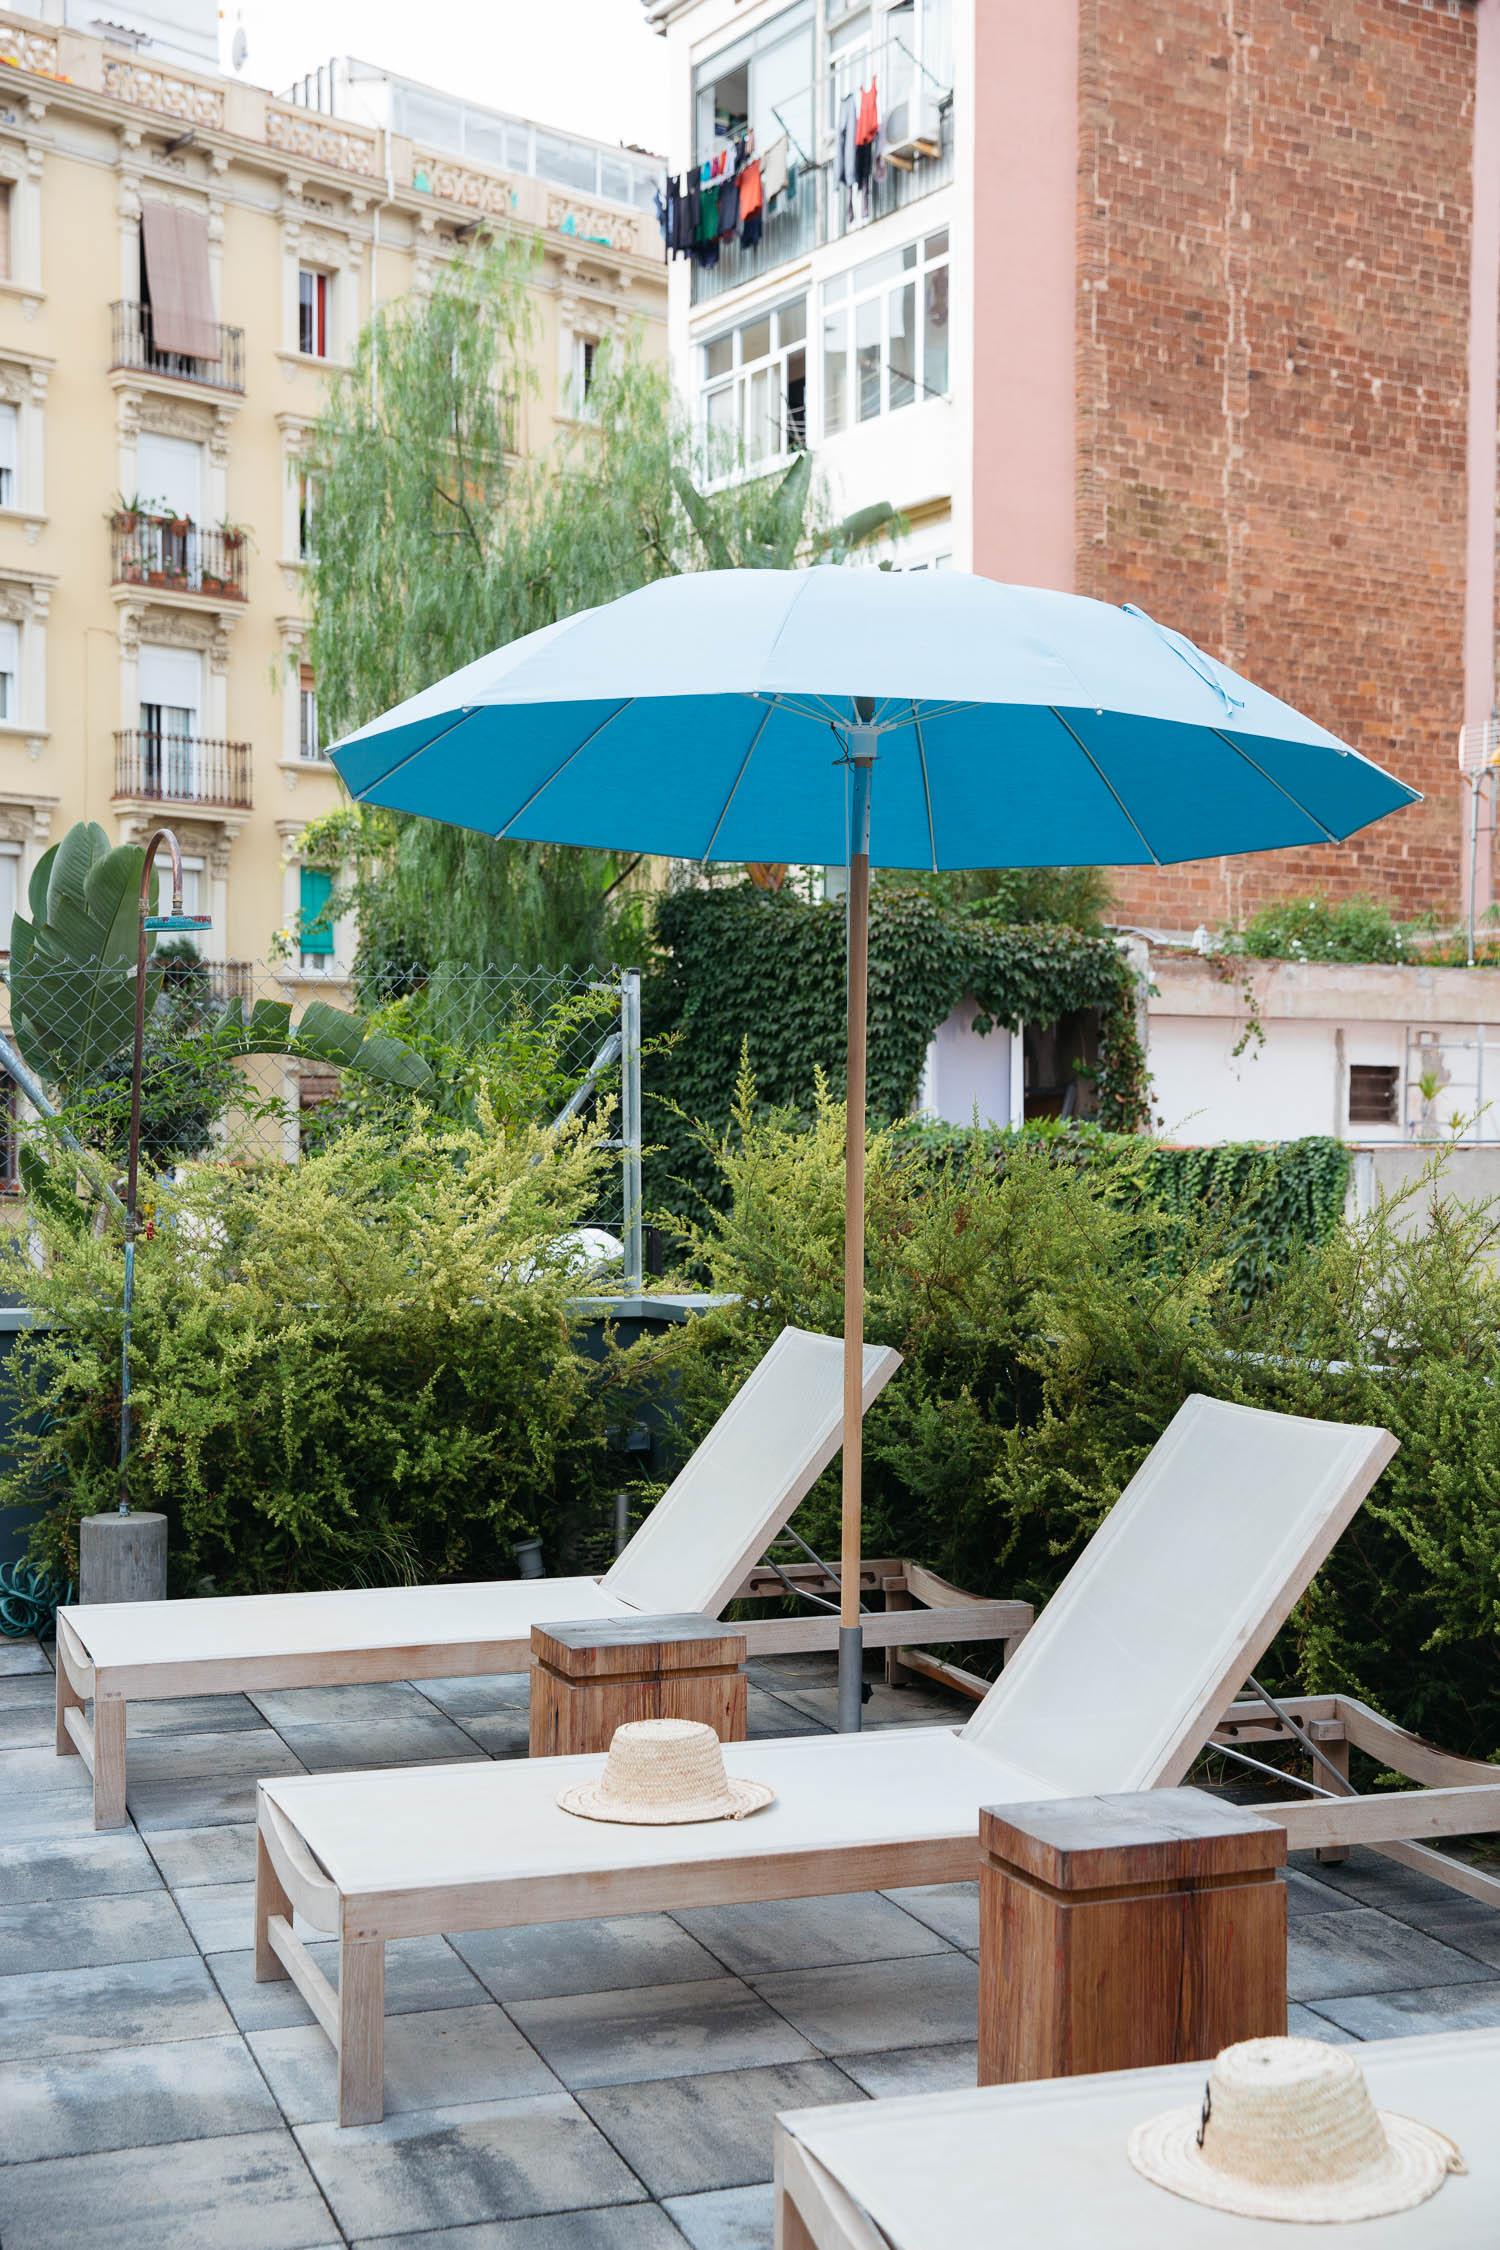 PhilippaLangley_Barcelona-6888.jpg